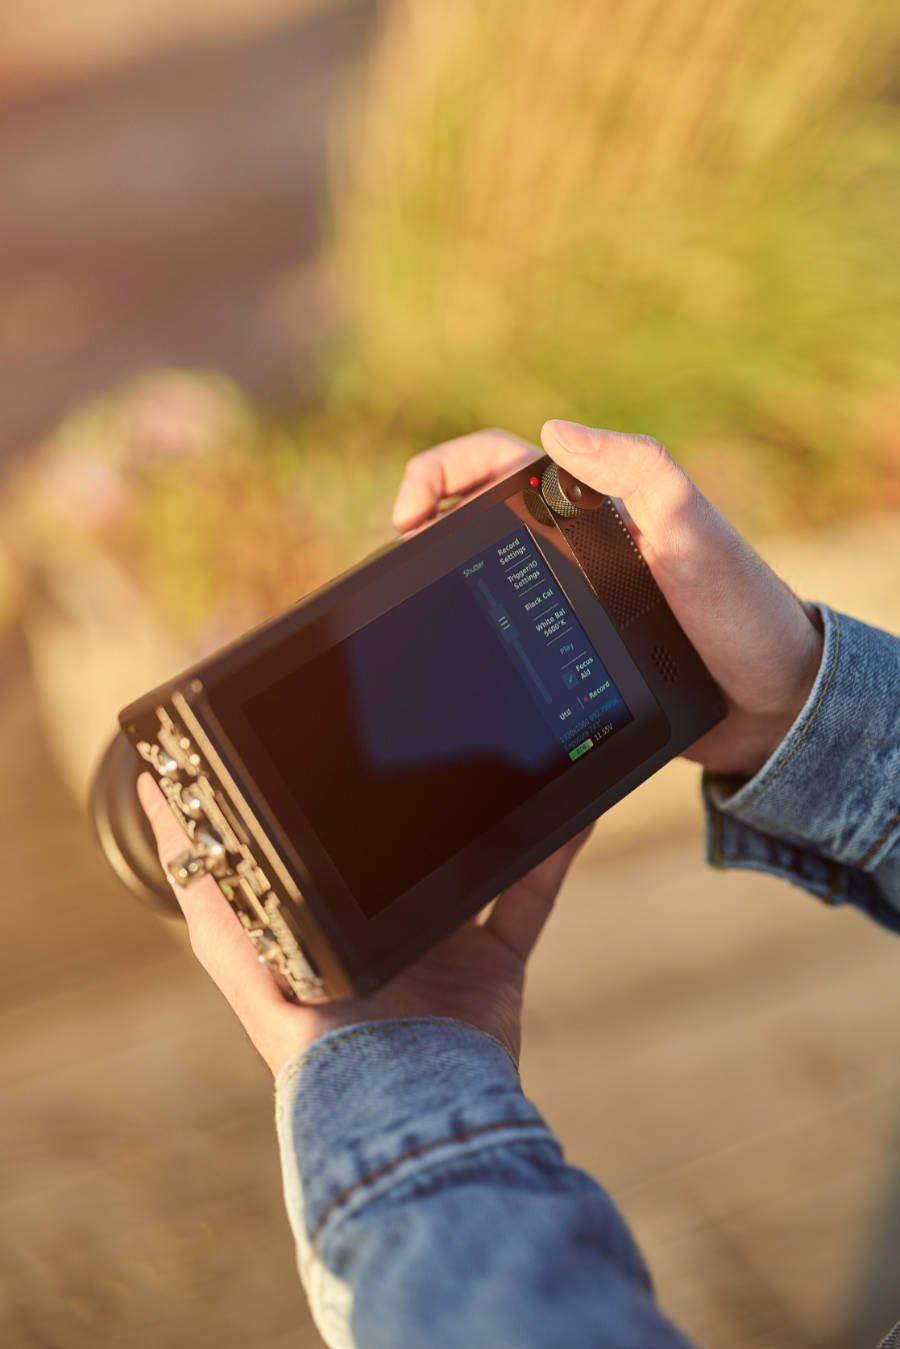 Kron high speed camera